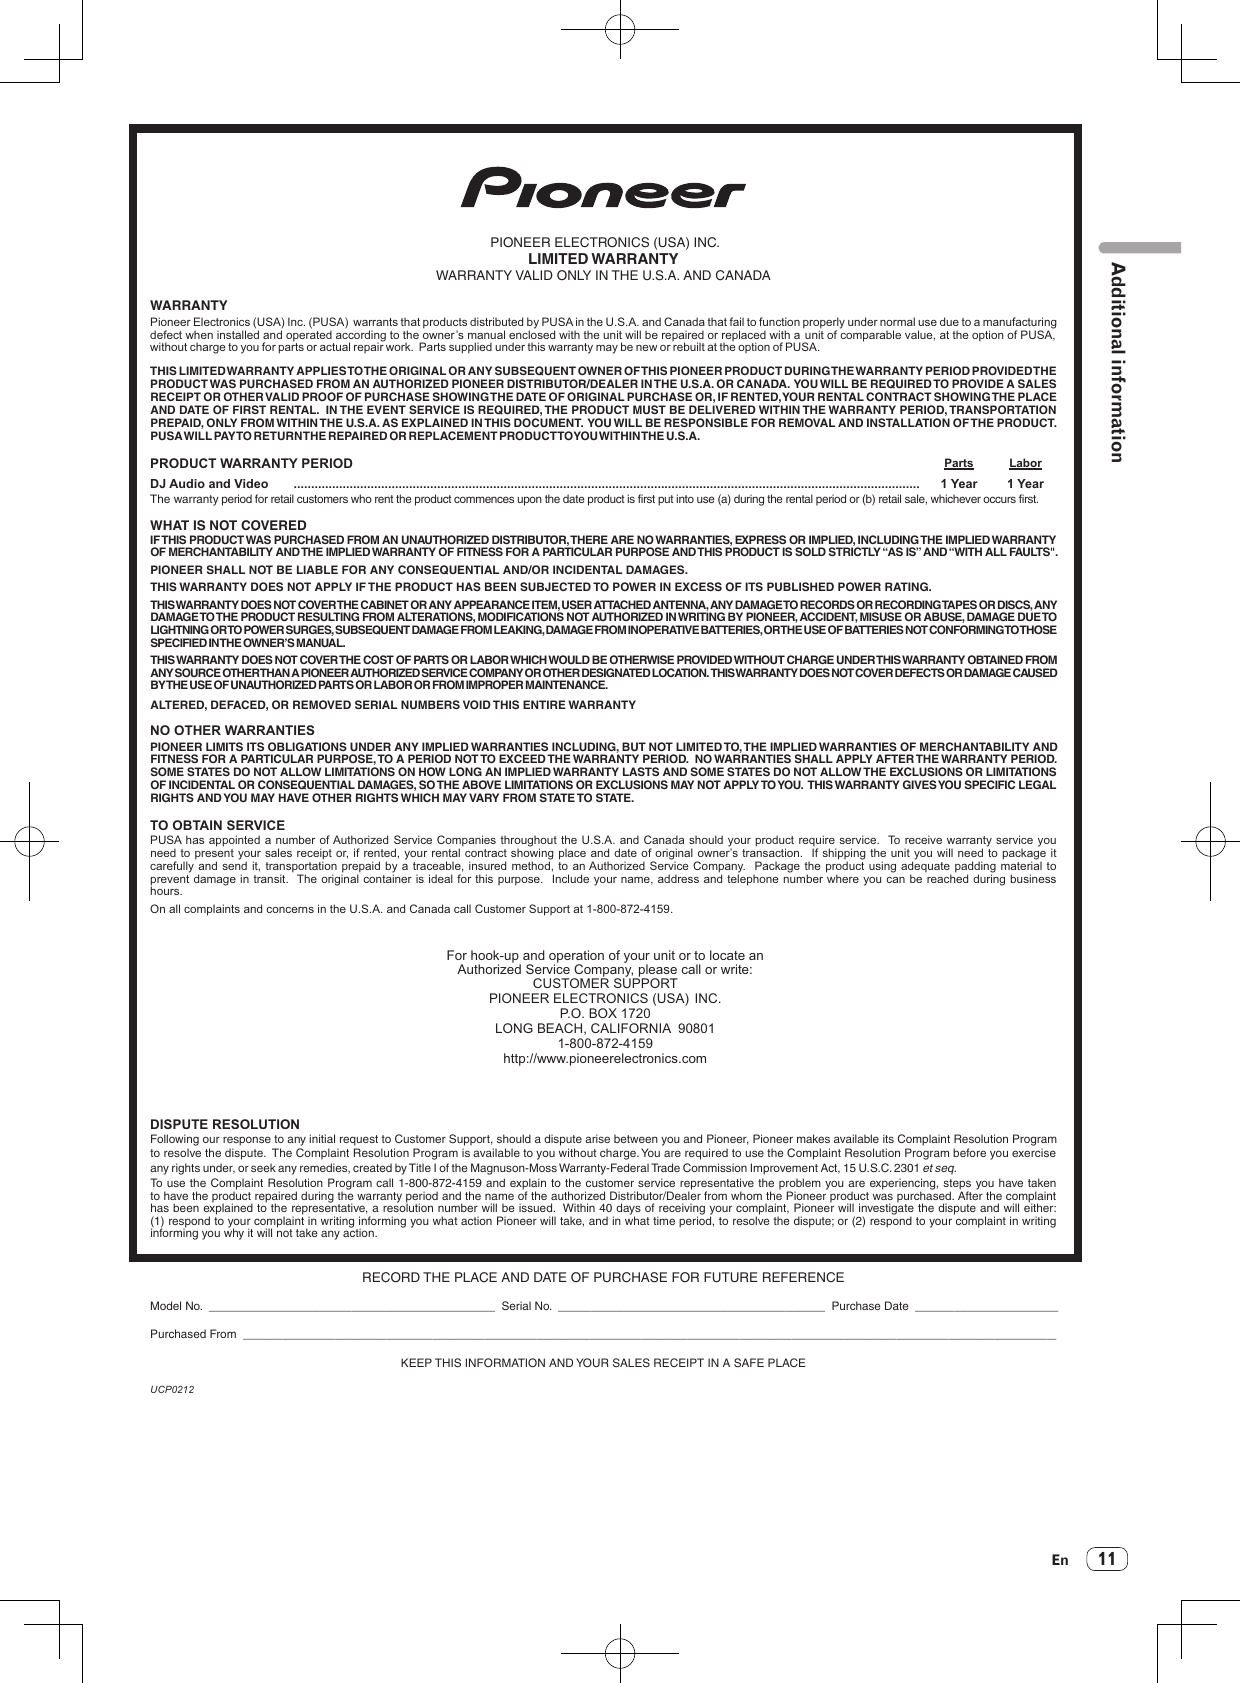 Pioneer 750K User Manual To The F5758d74 0c2a 44d6 aa2f 7d9e3597f811